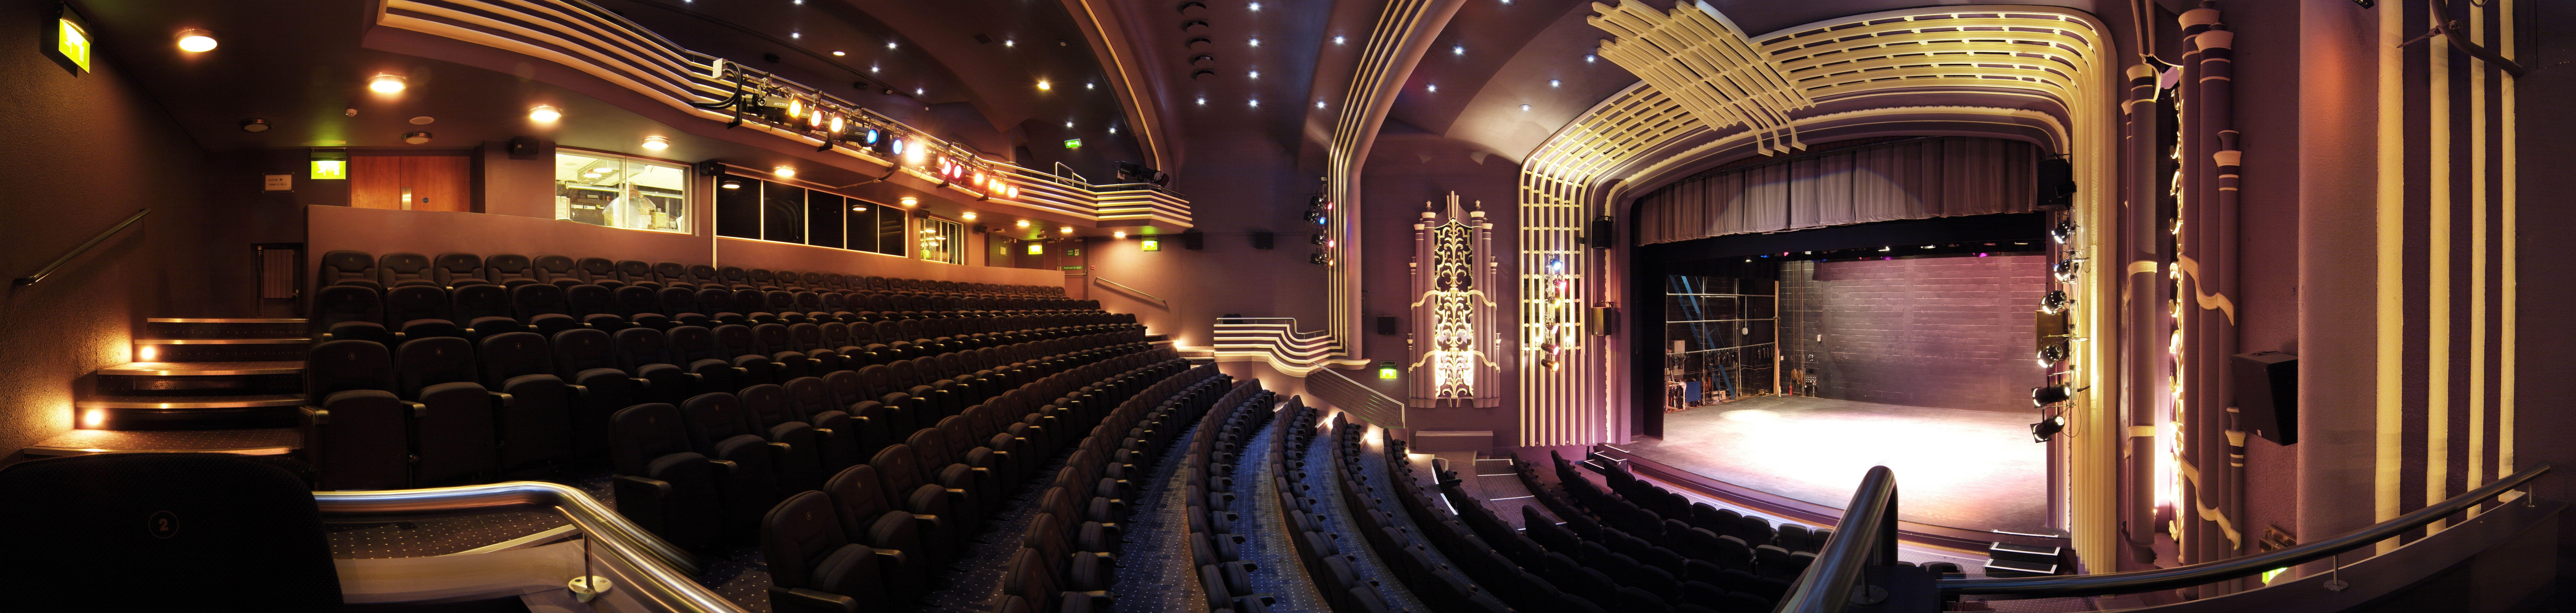 Horsham Arts Centre - The Capitol Theatre interior & stage   LA ...